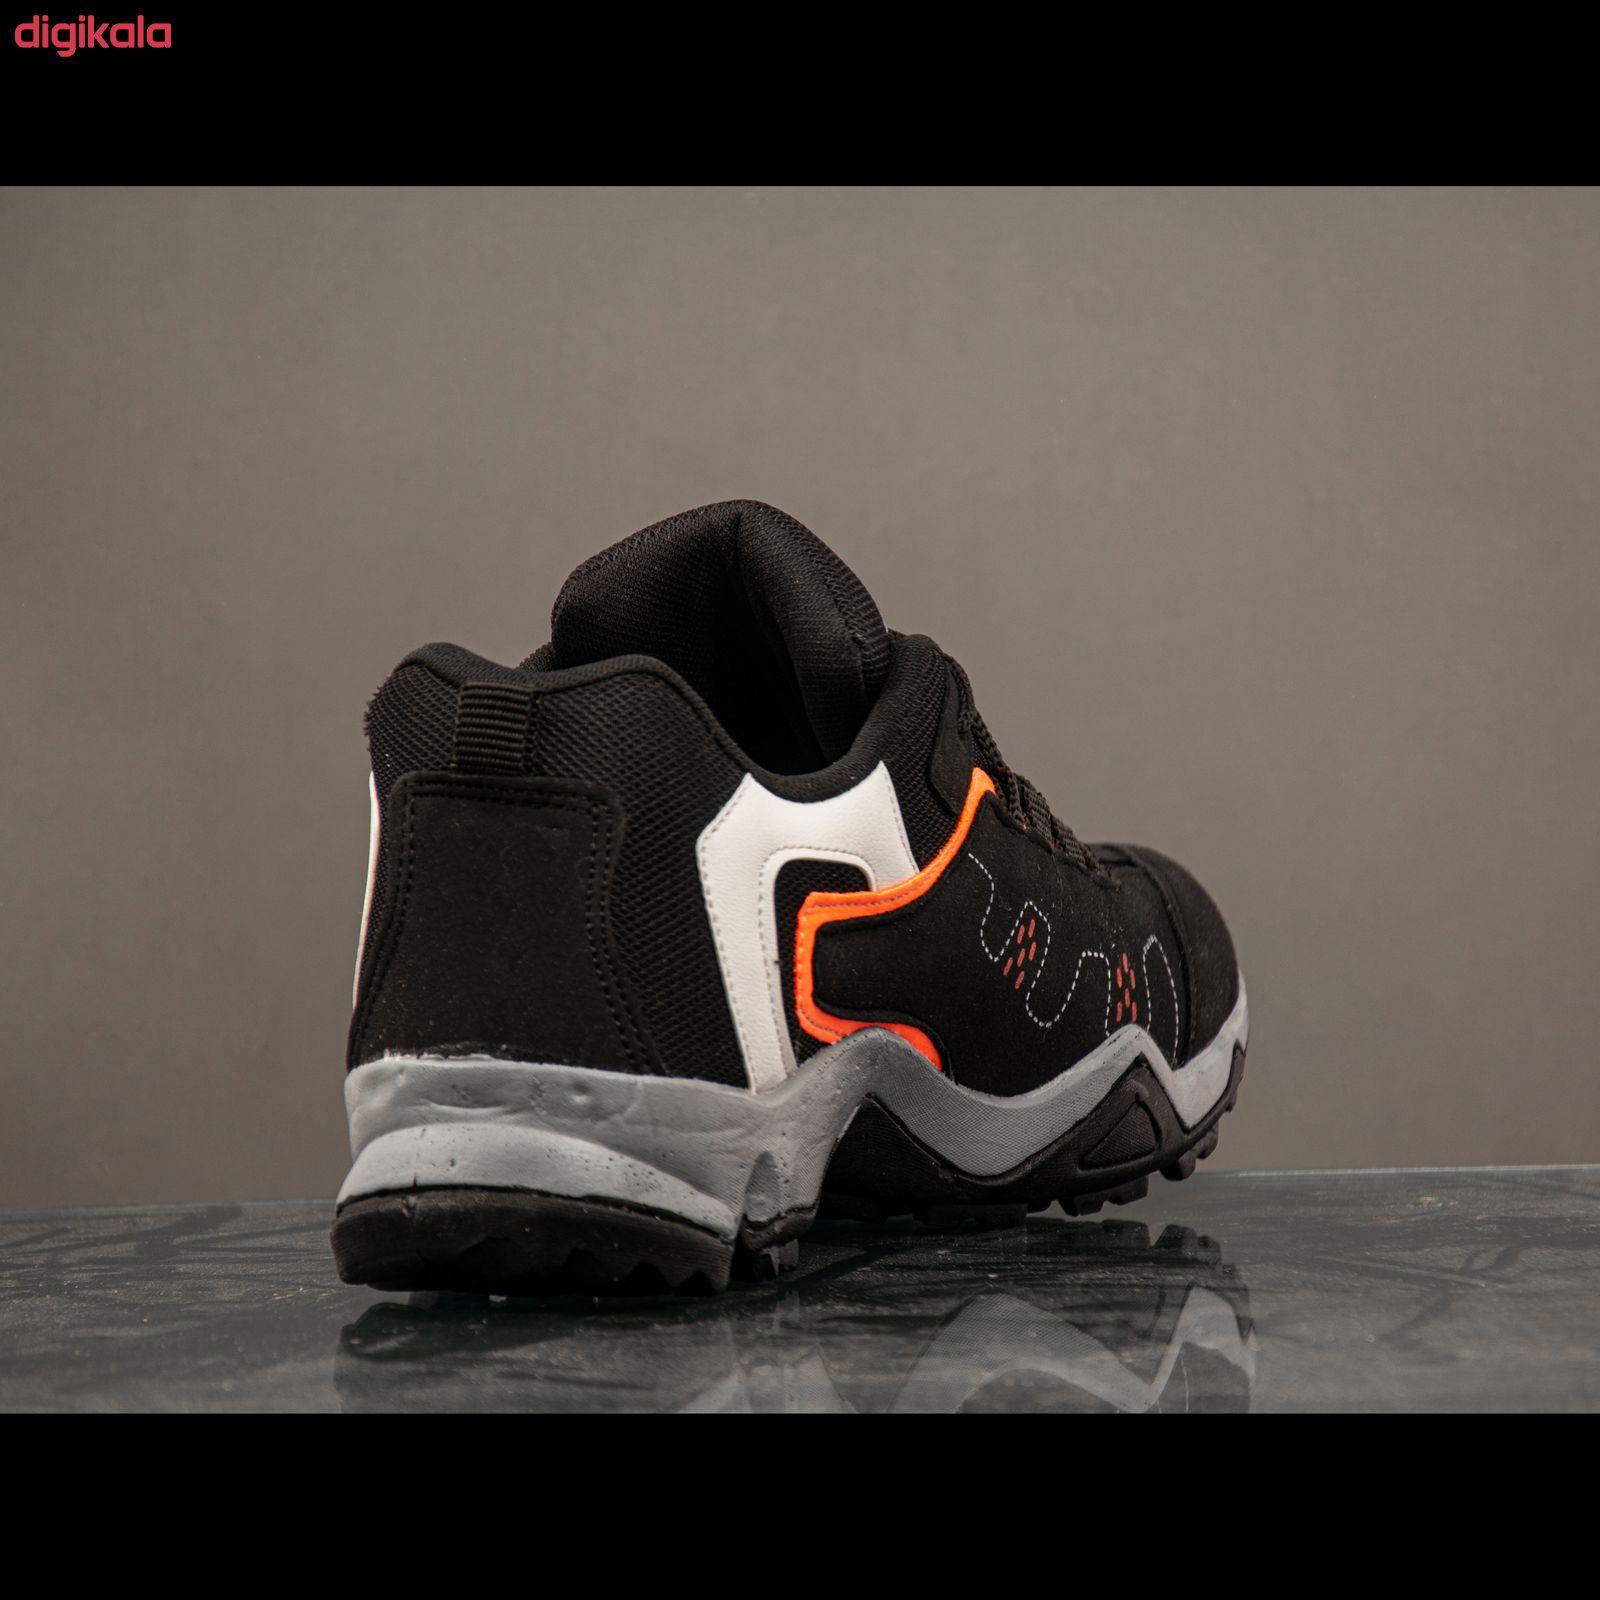 کفش کوهنوردی مردانه سارزی مدل hilas_M.e.s,Na.r.n.j_01 main 1 4